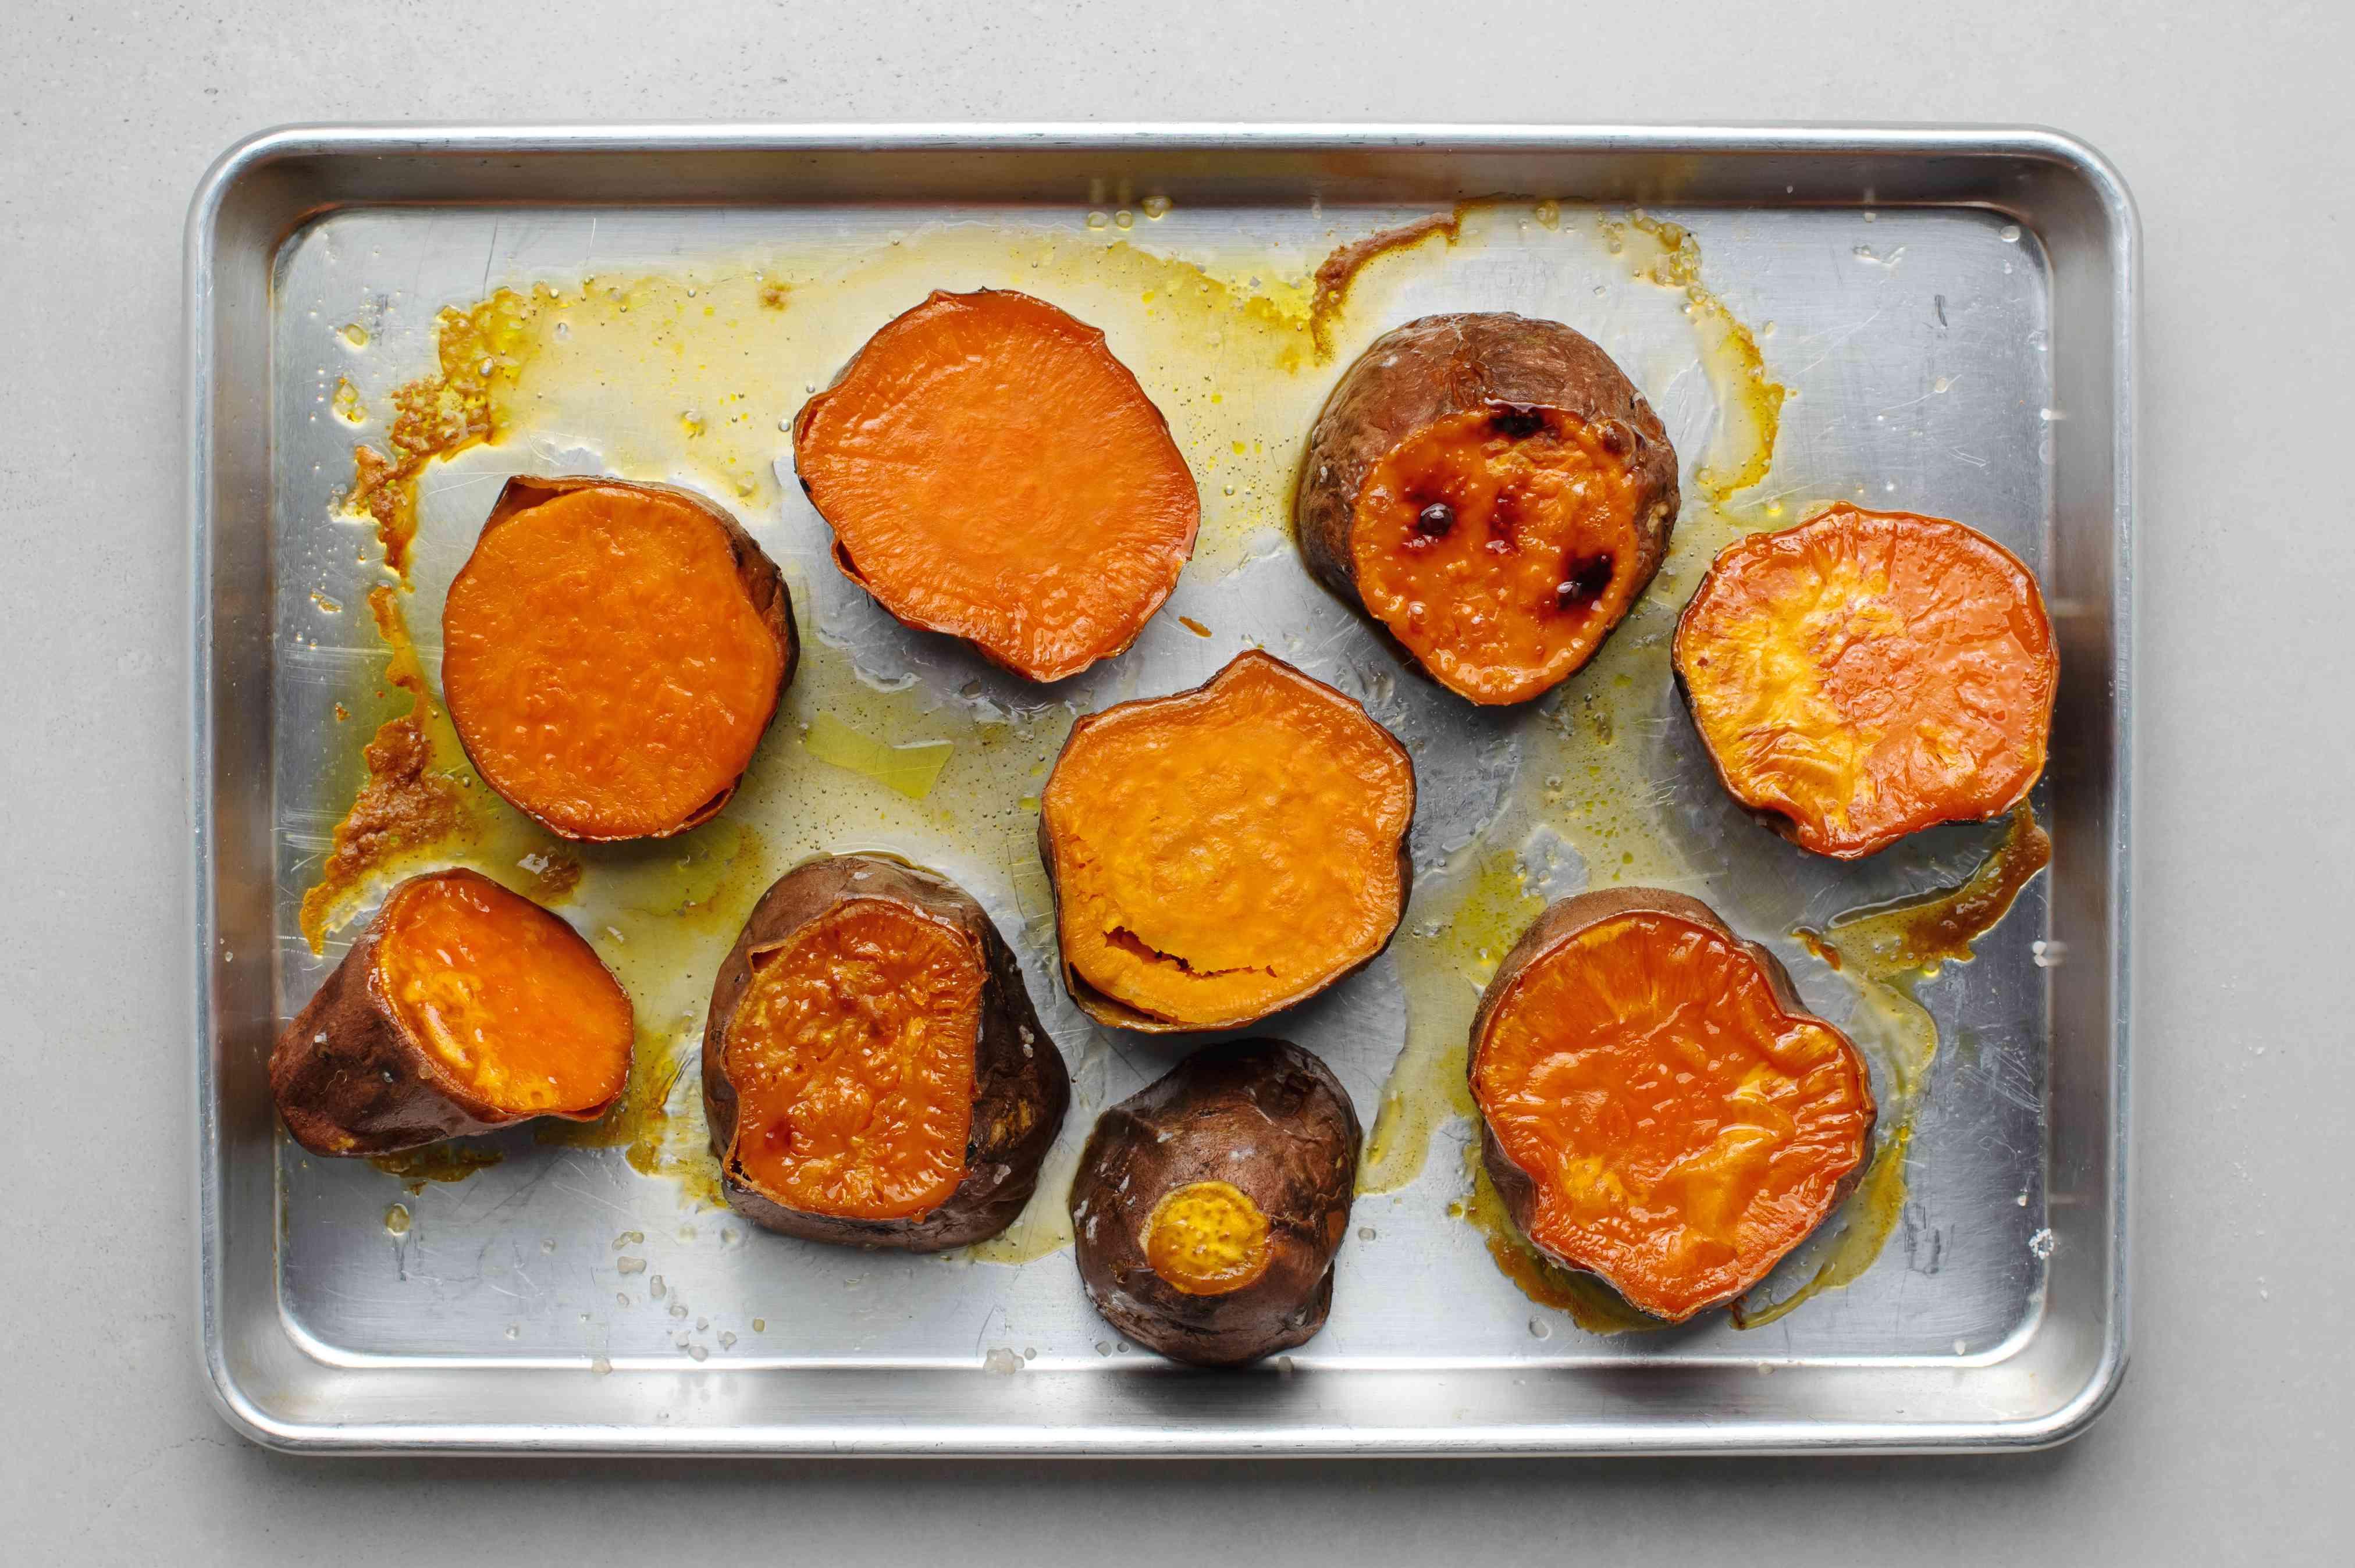 baked sweet potato pieces on a baking sheet